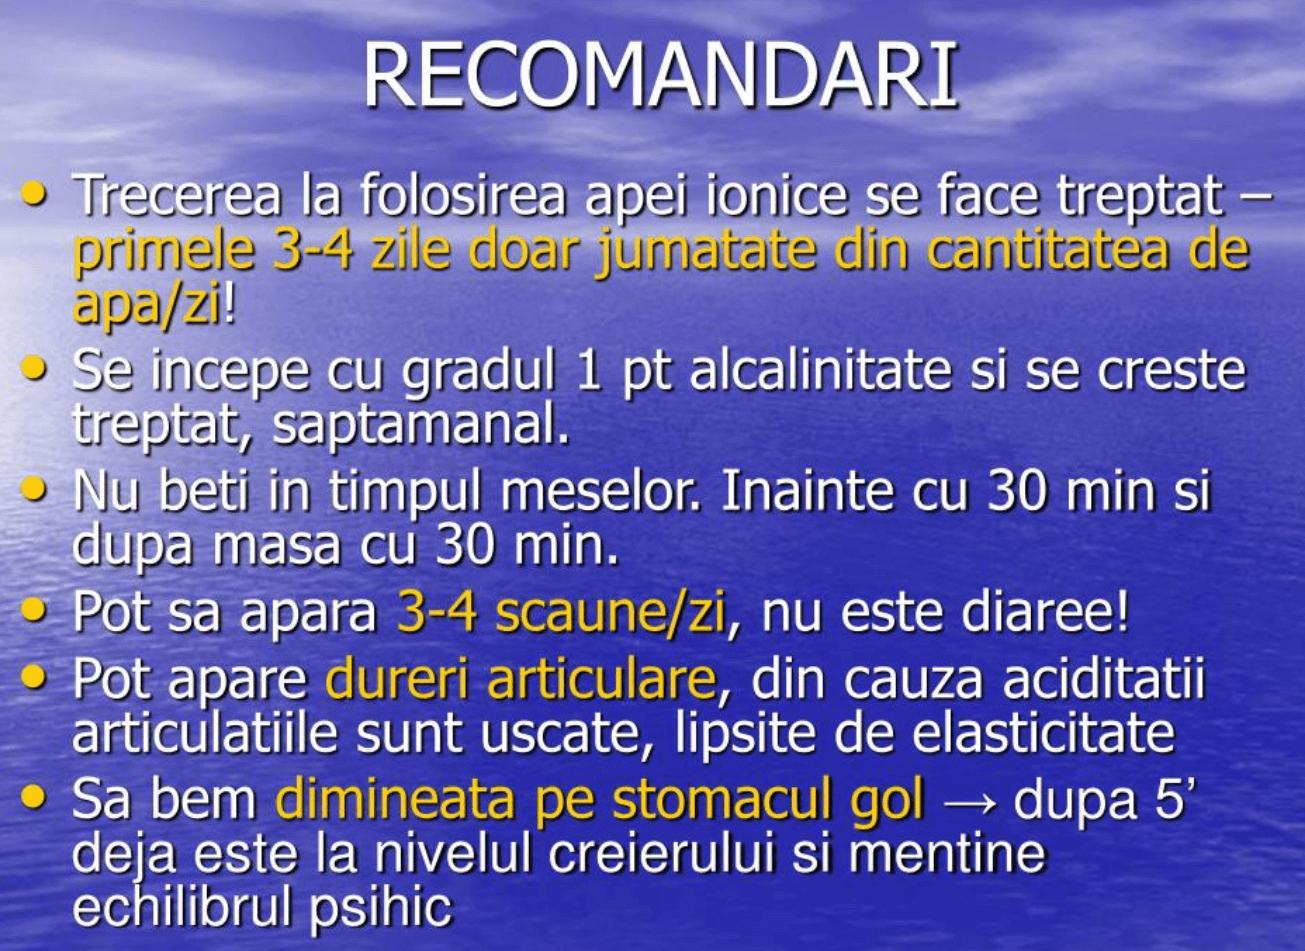 Recomandari apa alcalina